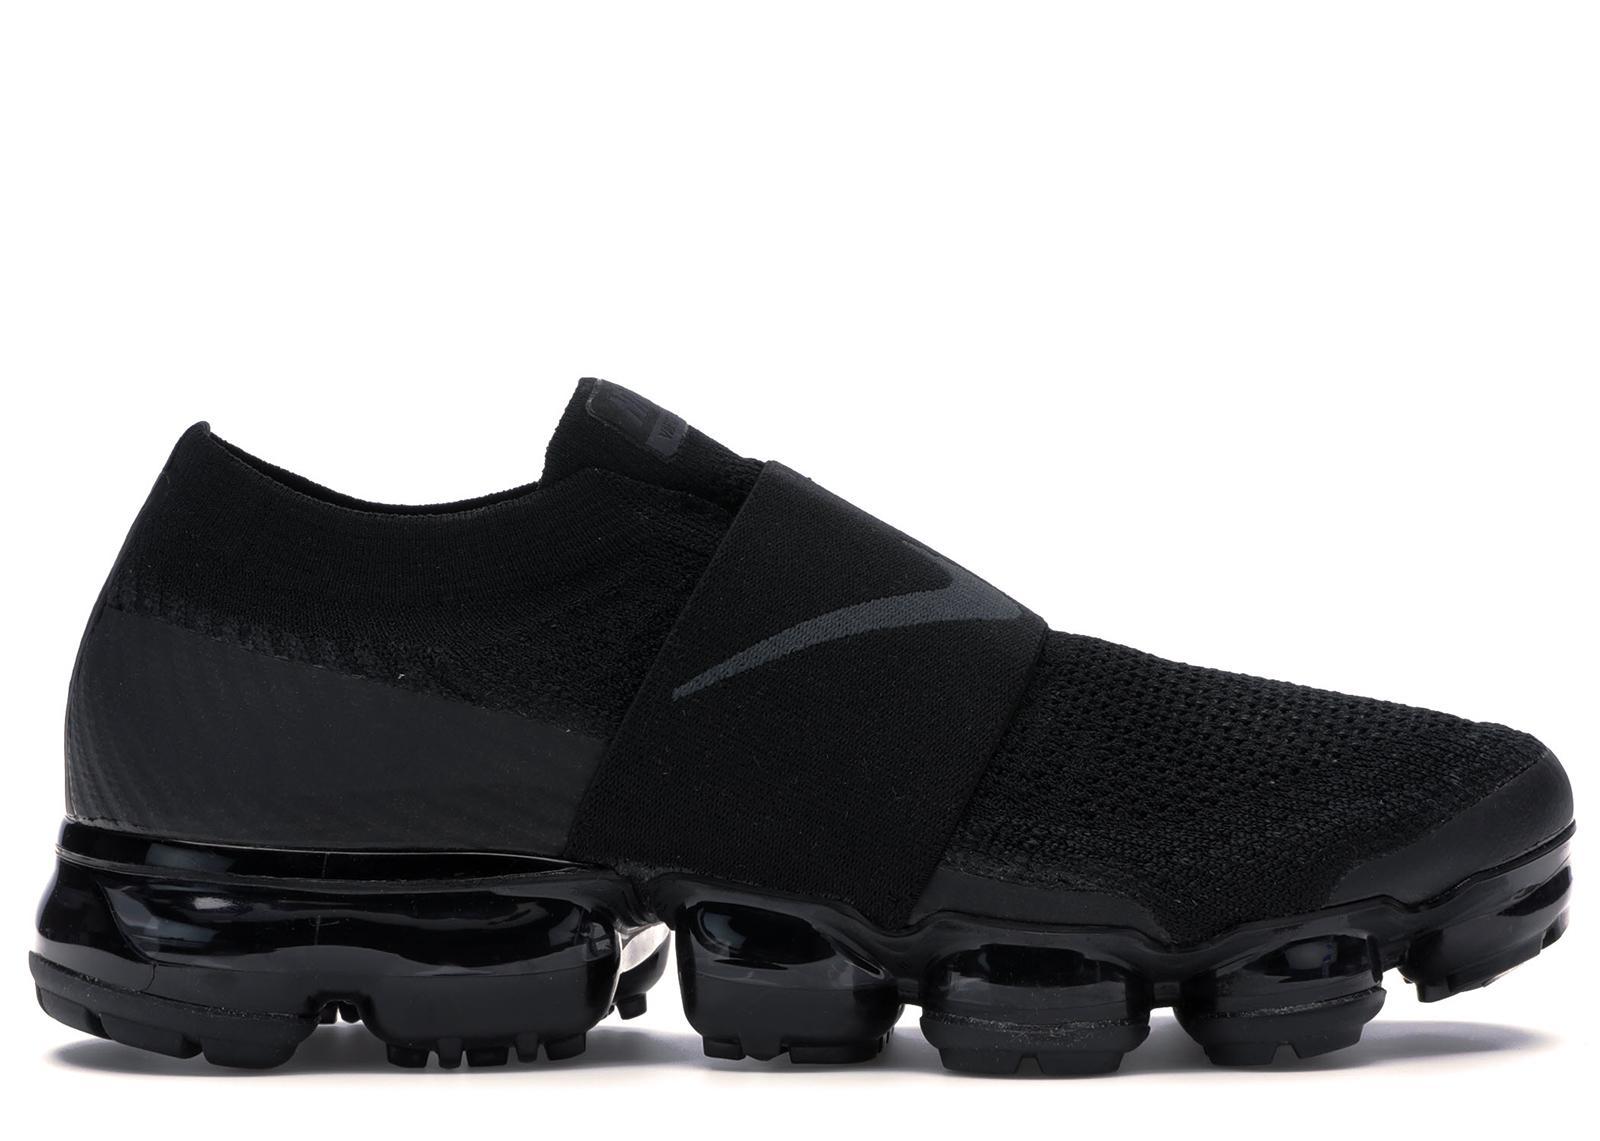 Nike Air Vapormax Moc Triple Black for